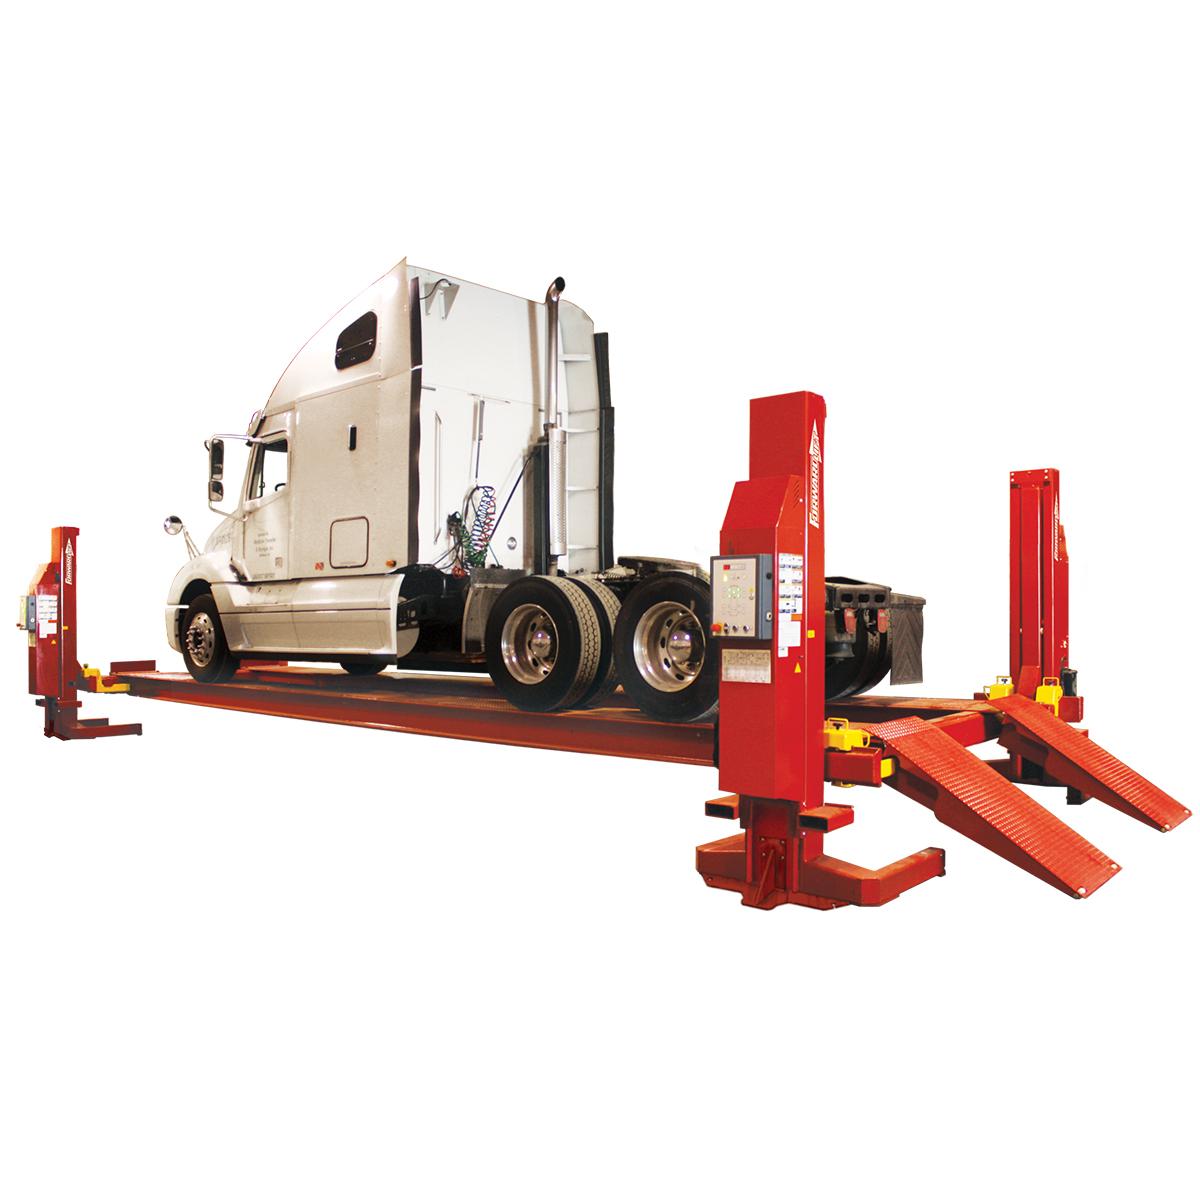 Forward Lift CR50/60 Heavy Duty 4-Post Lifts